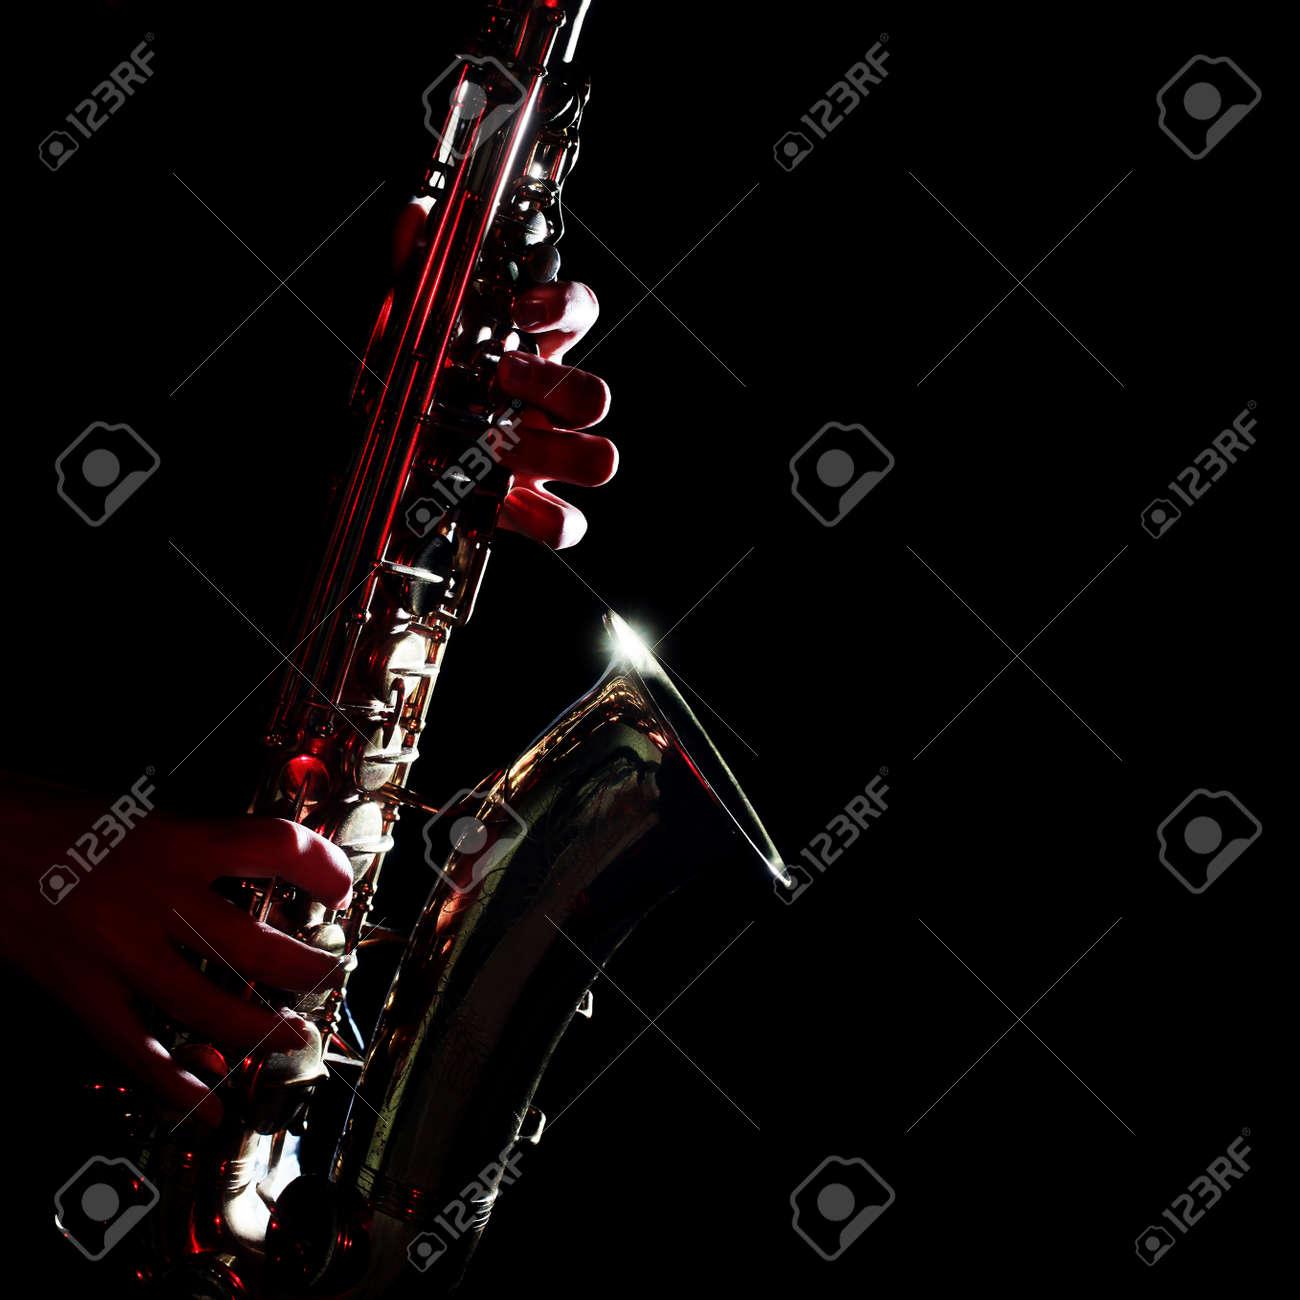 Saxophone isolated on black closeup  Saxophonist with alto sax music instruments Standard-Bild - 35860658